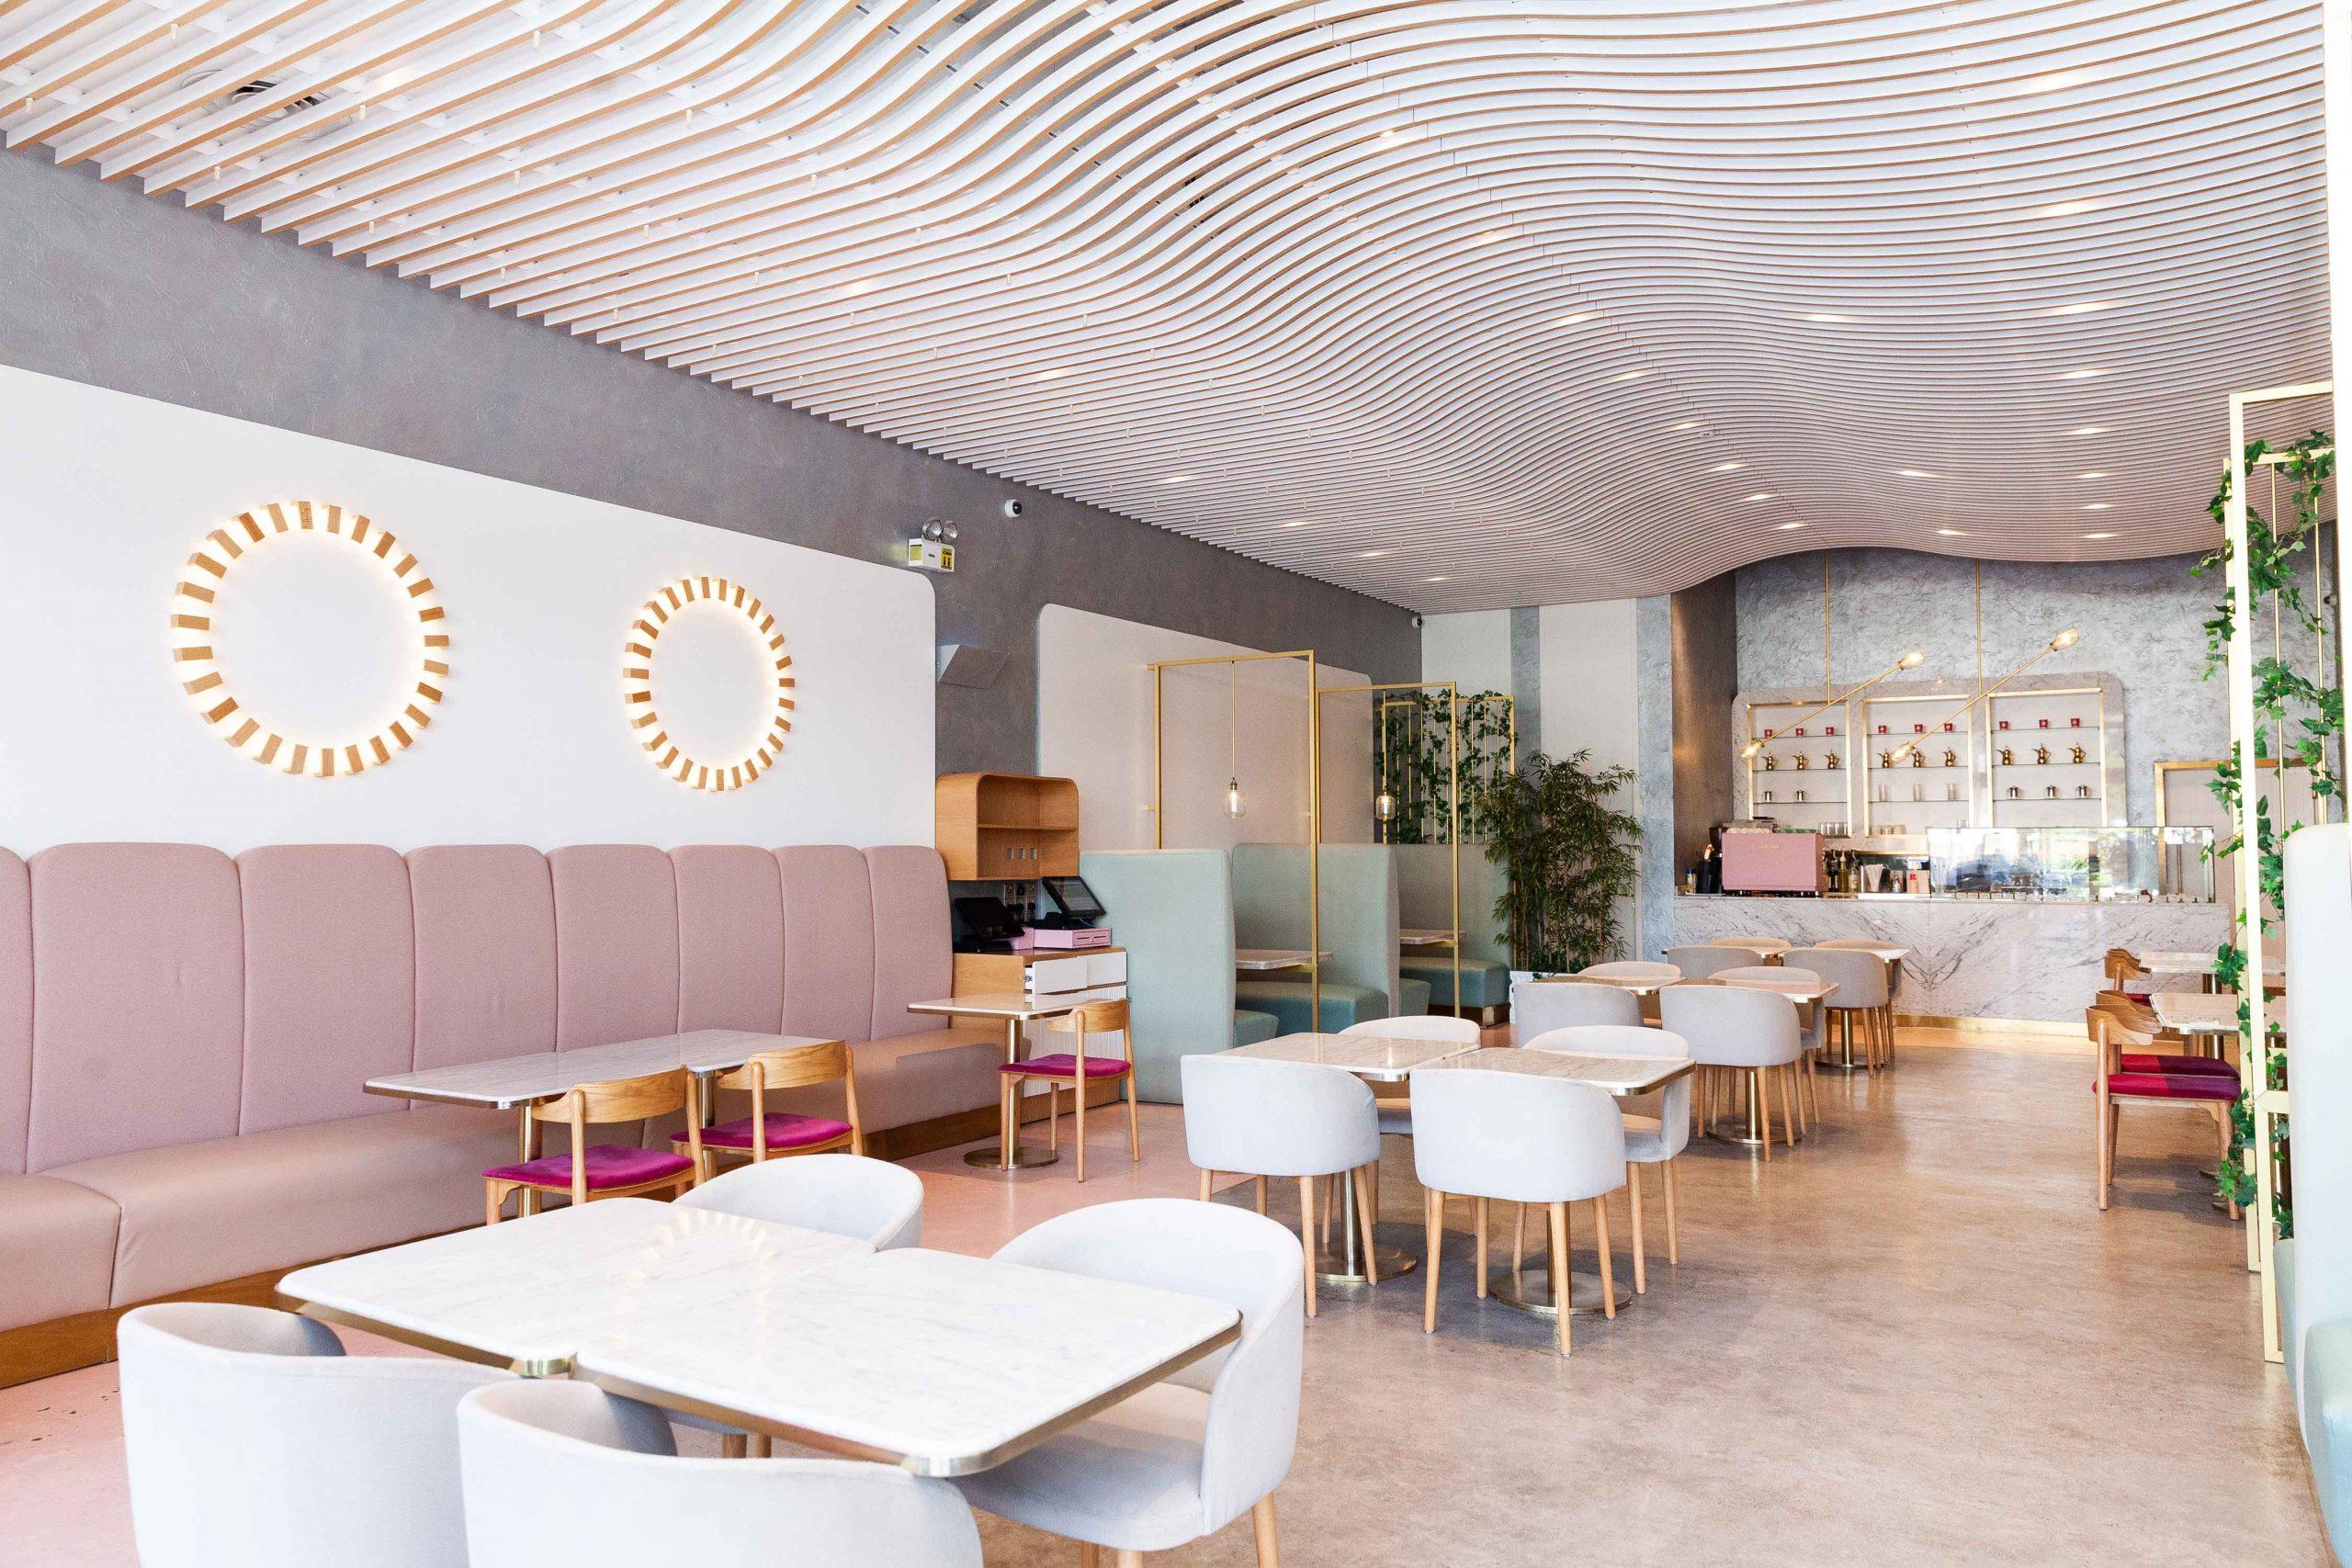 Jarlicious-Interior Design Dubai